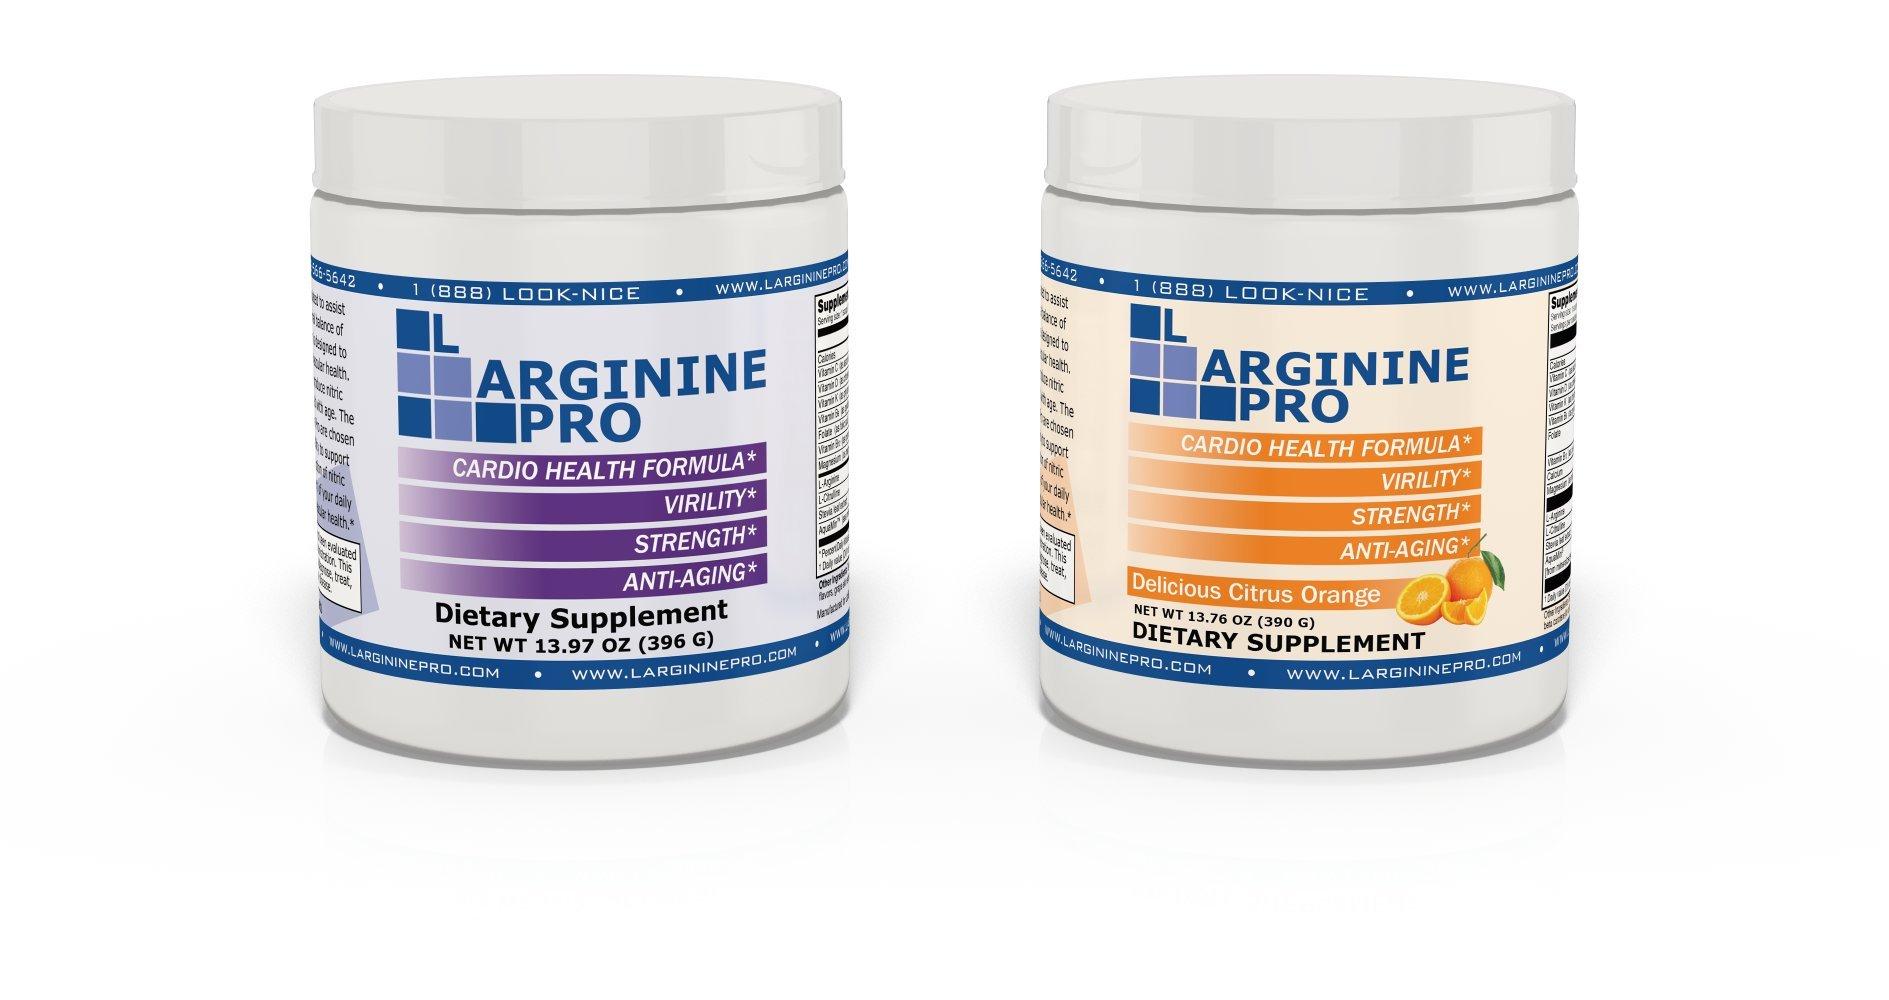 L-arginine Pro, #1 NOW L-arginine Supplement - 5,500mg of L-arginine PLUS 1,100mg L-Citrulline + Vitamins & Minerals for Cardio Health, Blood Pressure, Cholesterol, Energy (Berry & Orange, 2 Jars)